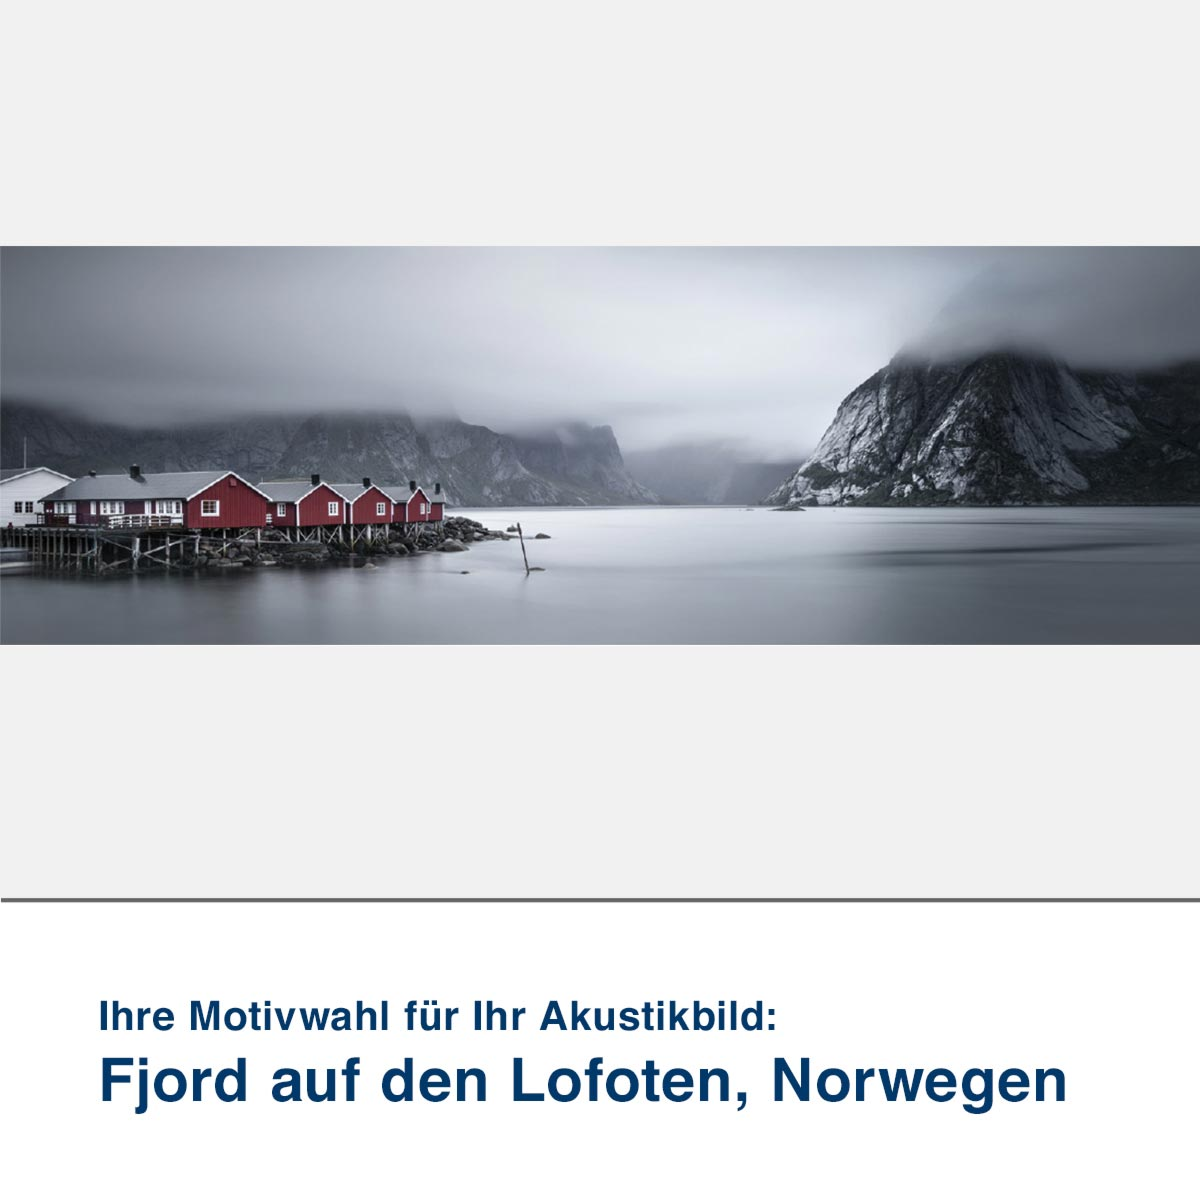 Akustikbild Motiv Fjord auf den Lofoten, Norwegen